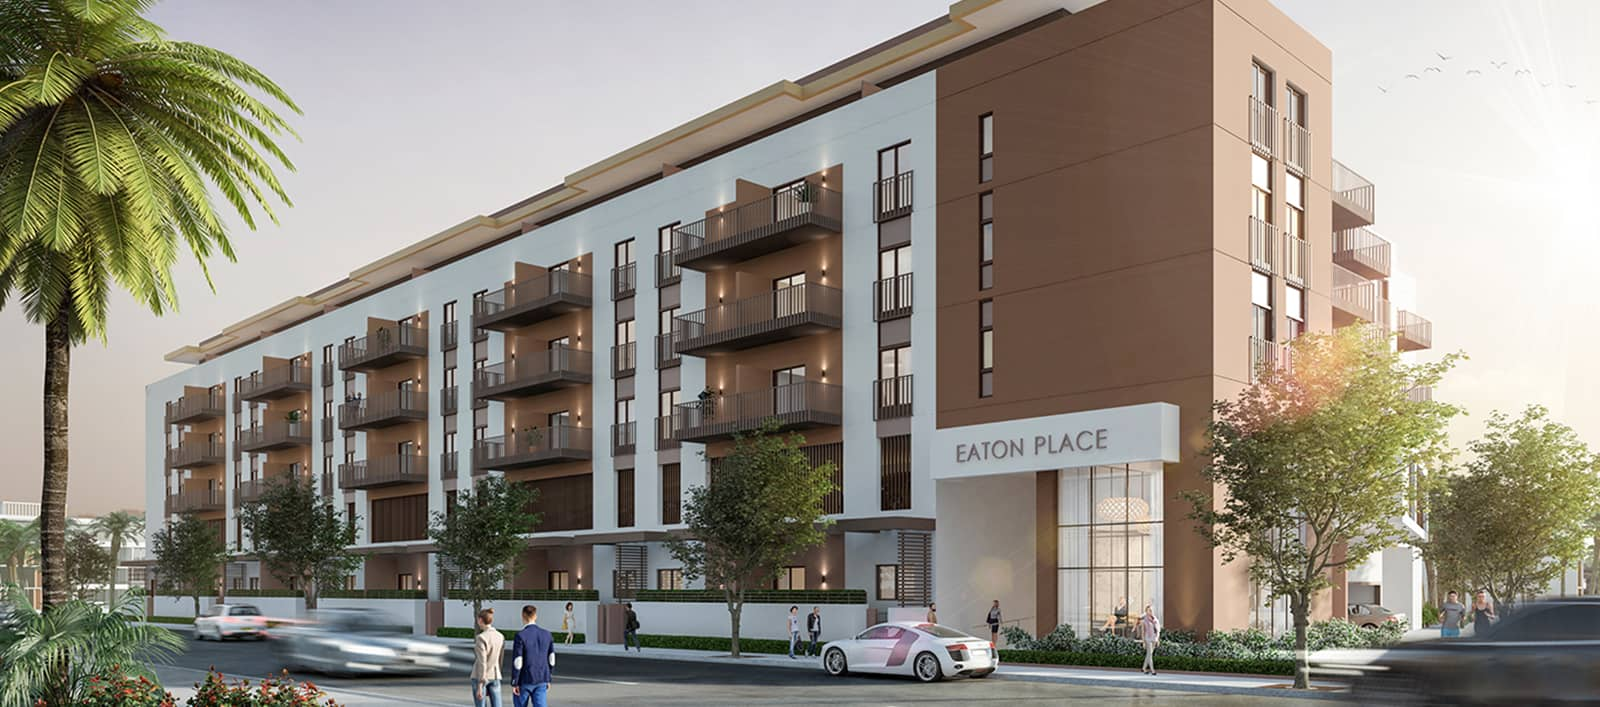 Eaton Place